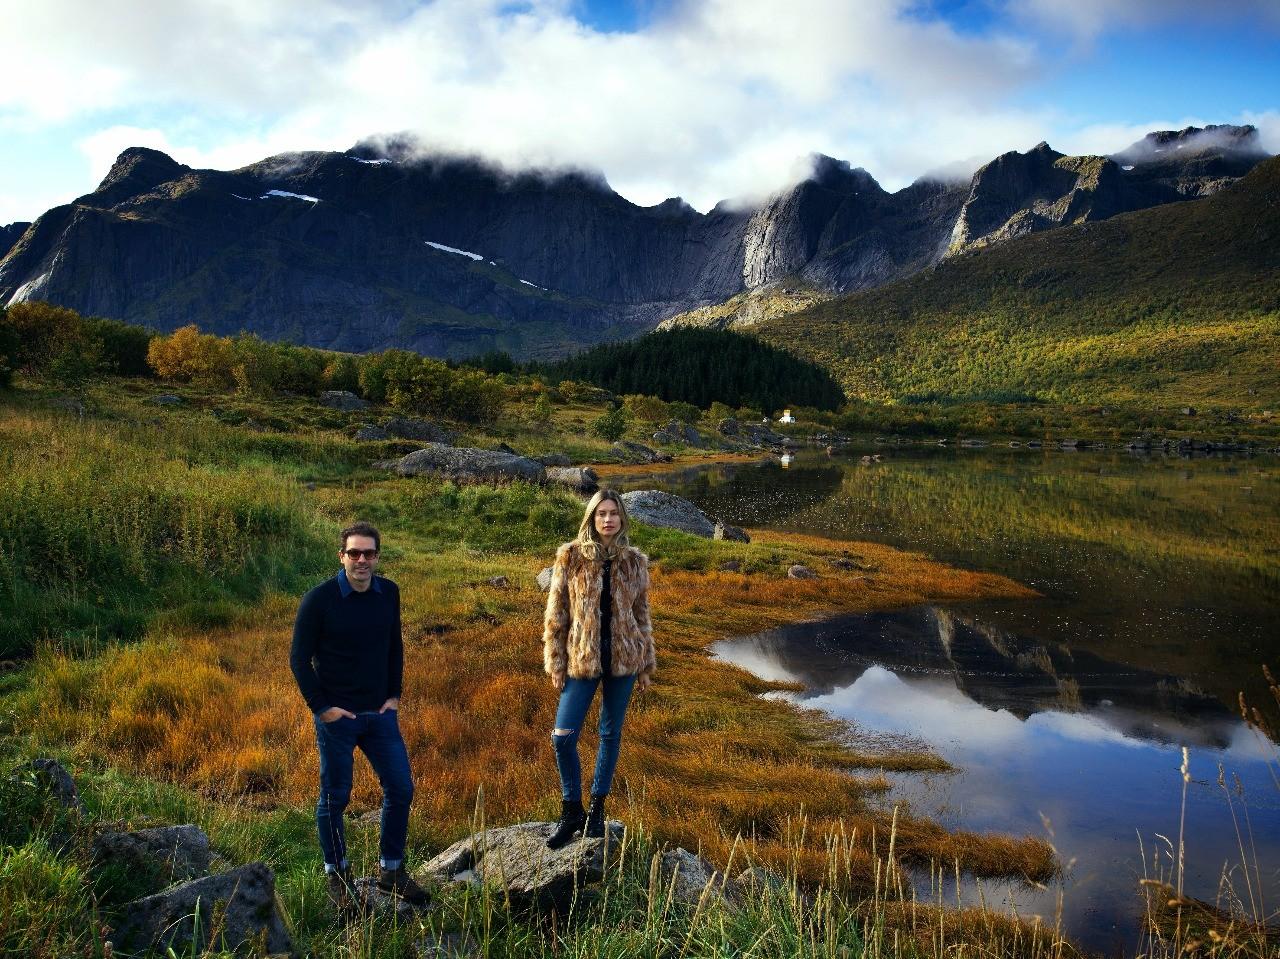 Outro cenário deslumbrante na Noruega (Foto: Gustavo Zylbersztajn)